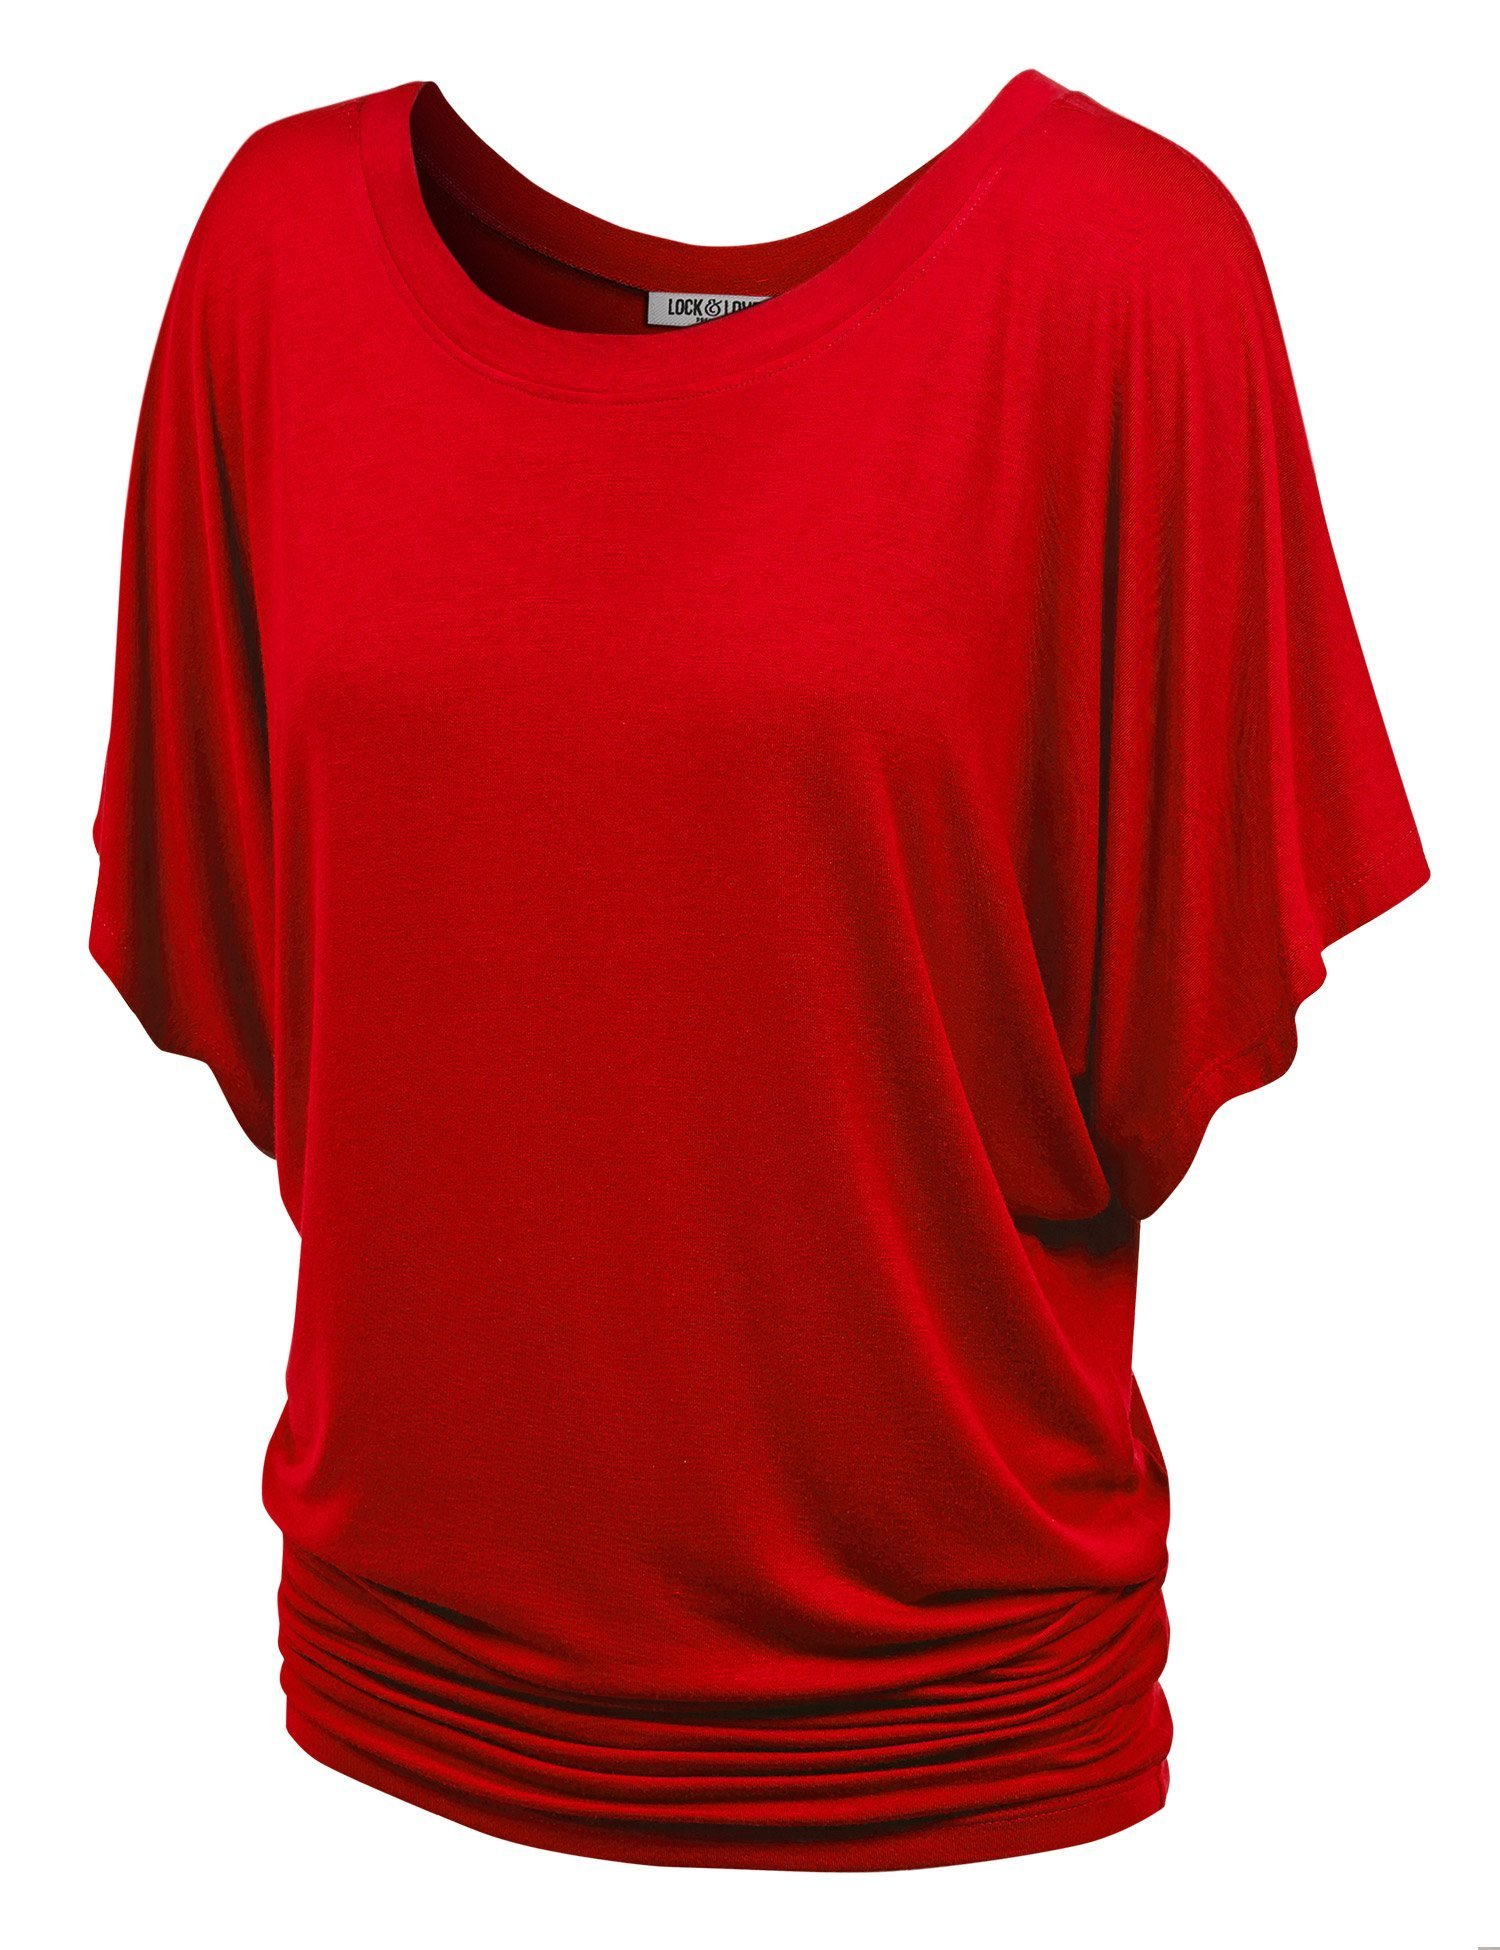 WT742 Womens Boat Neck Short Sleeve Dolman Drape Top XXXL RED